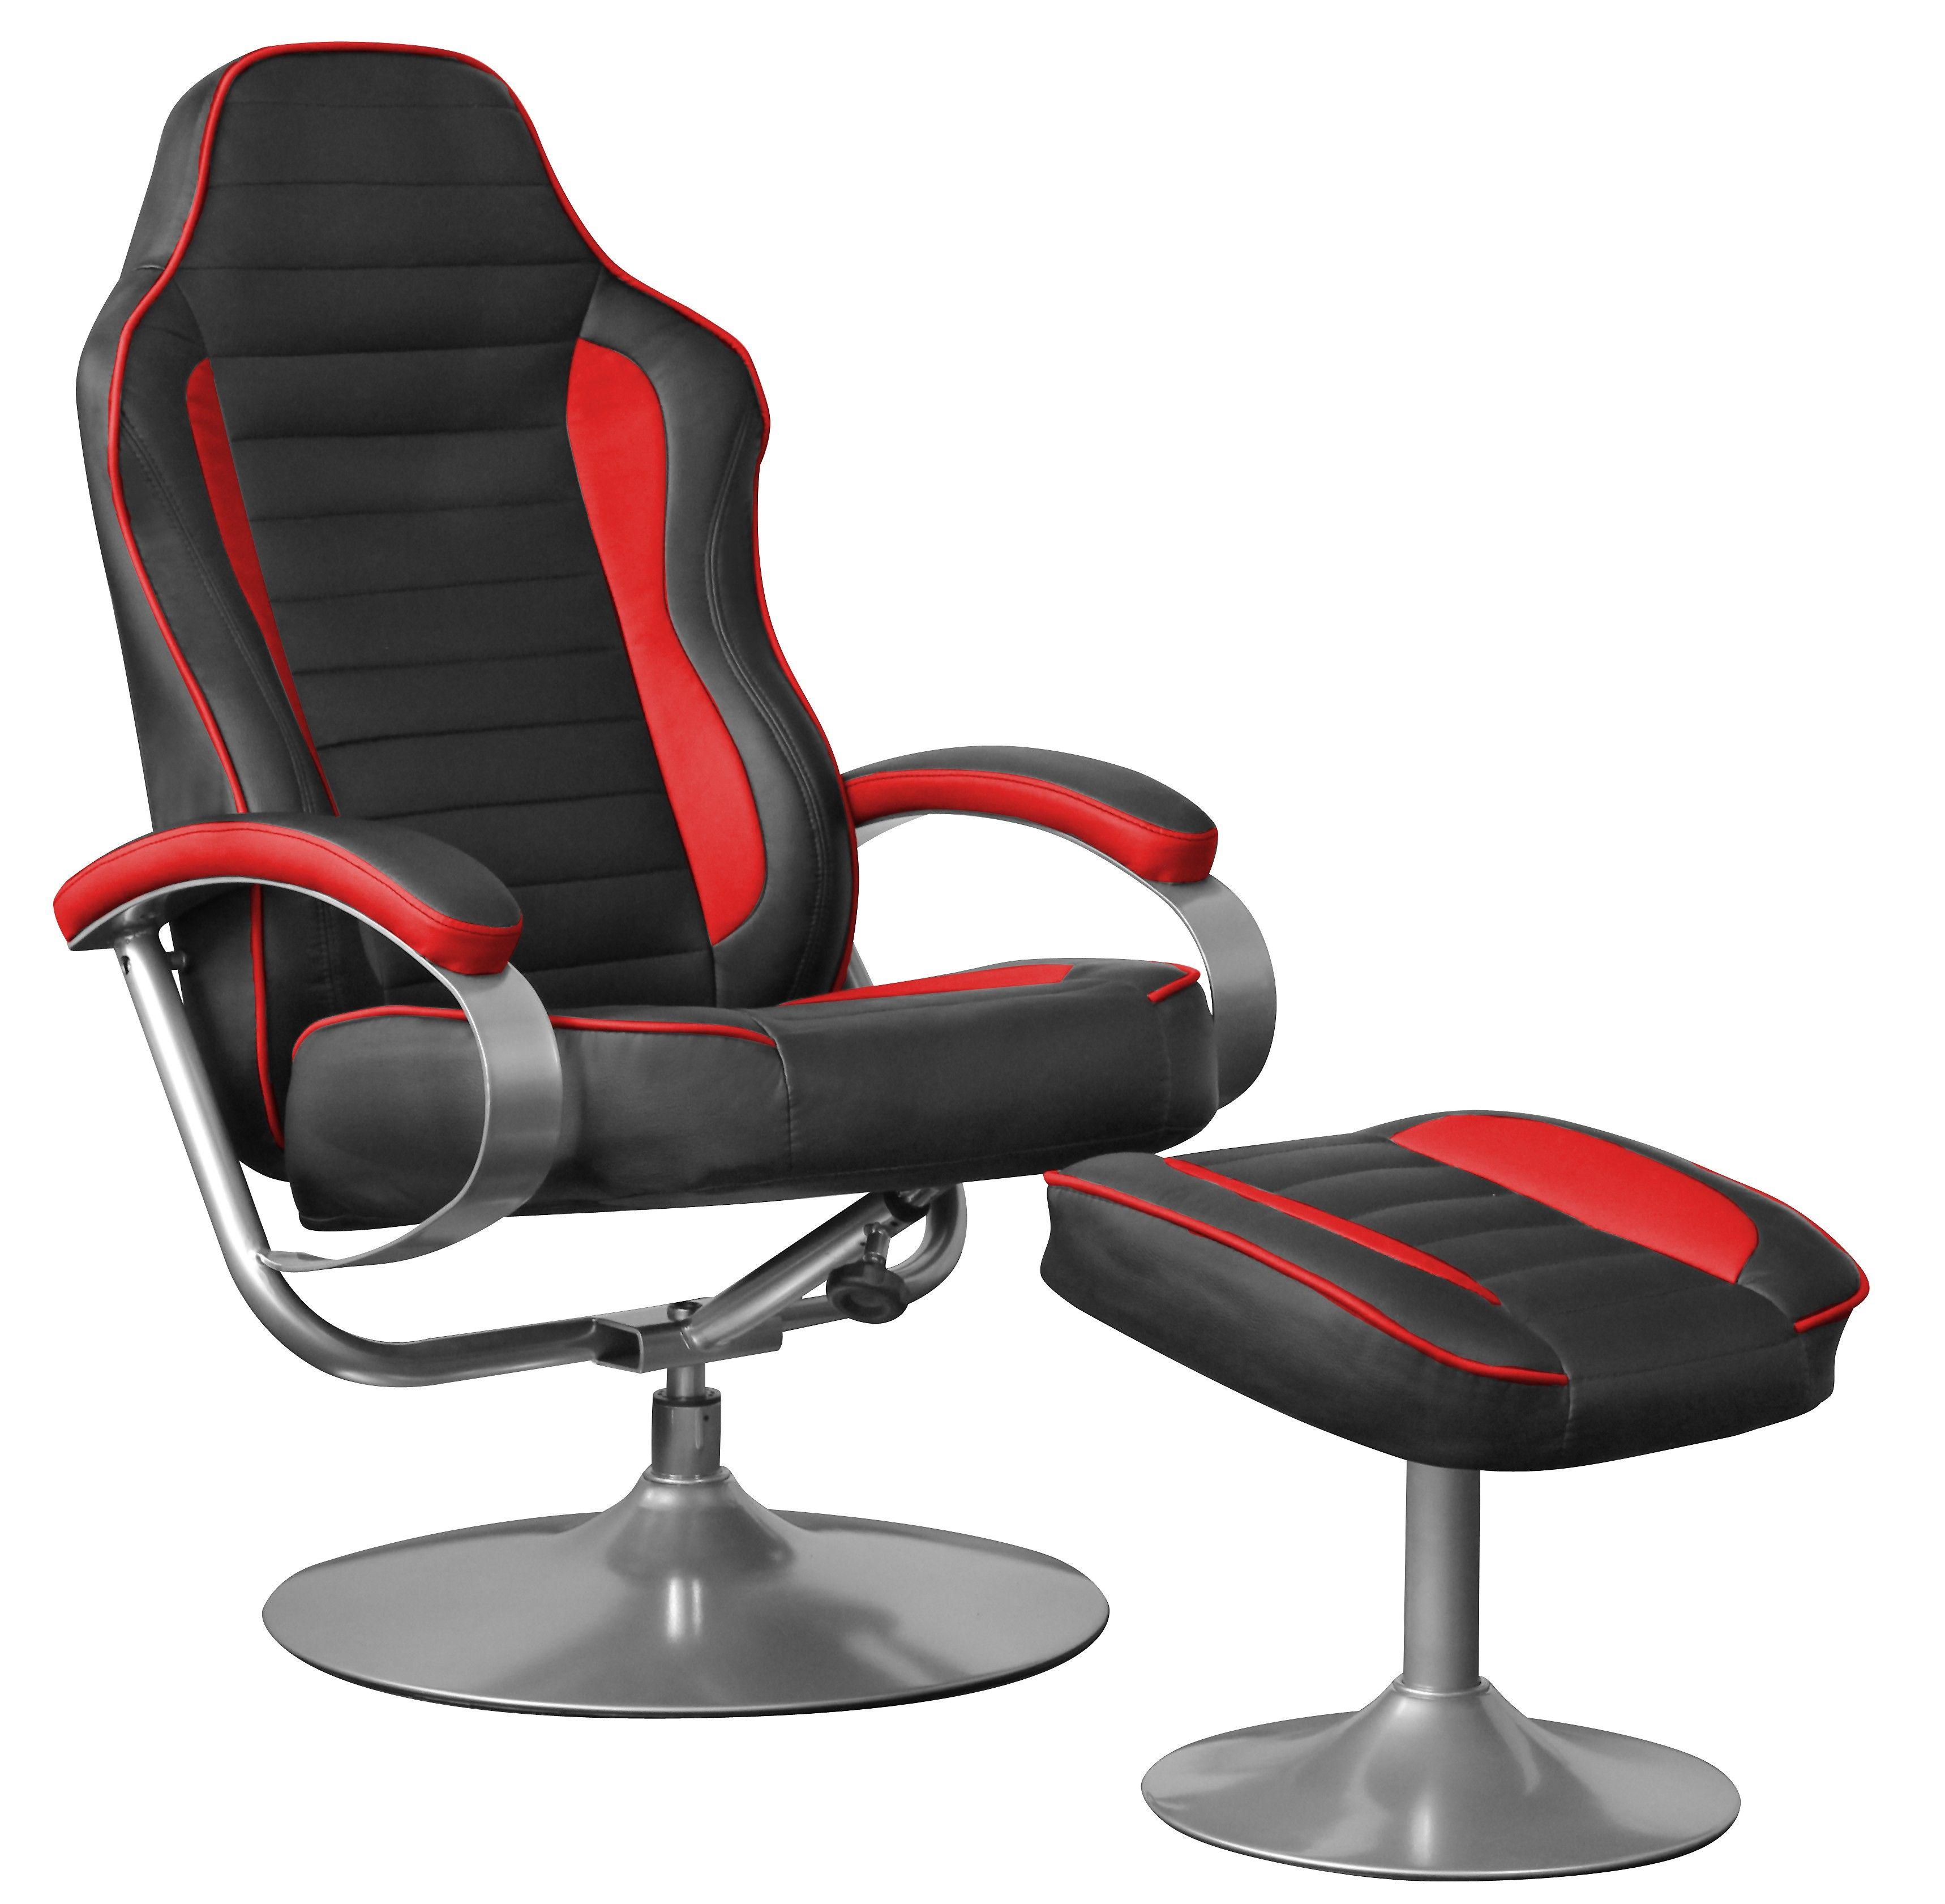 fernsehsessel sporting tv relaxsessel schwarz rot drehbar mit hocker chair massage chair